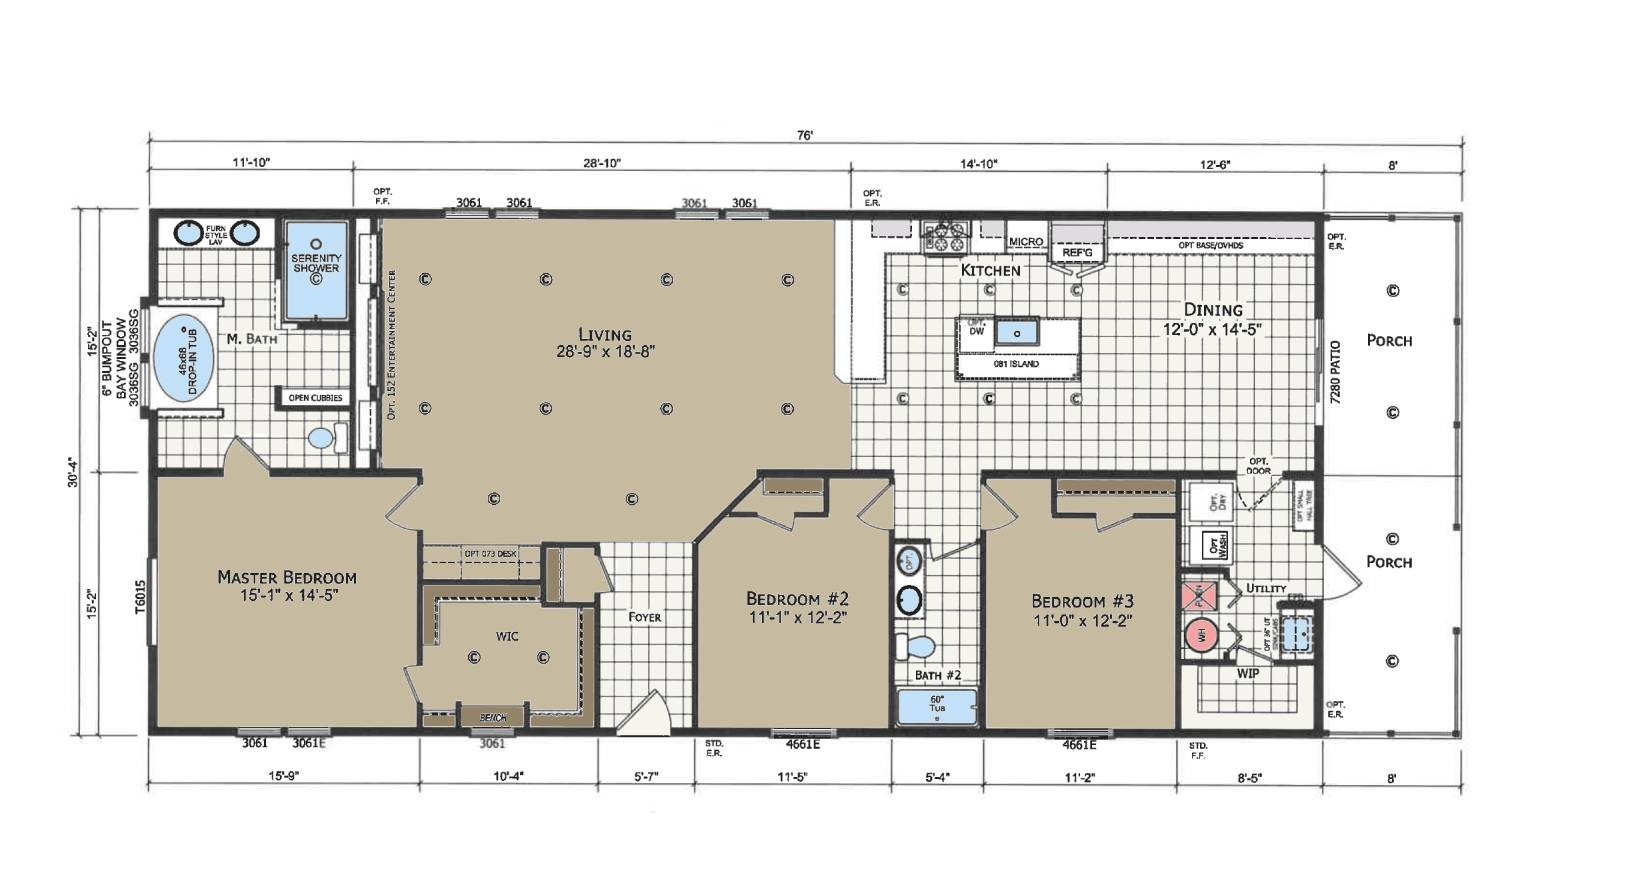 floorplan image for unit 358